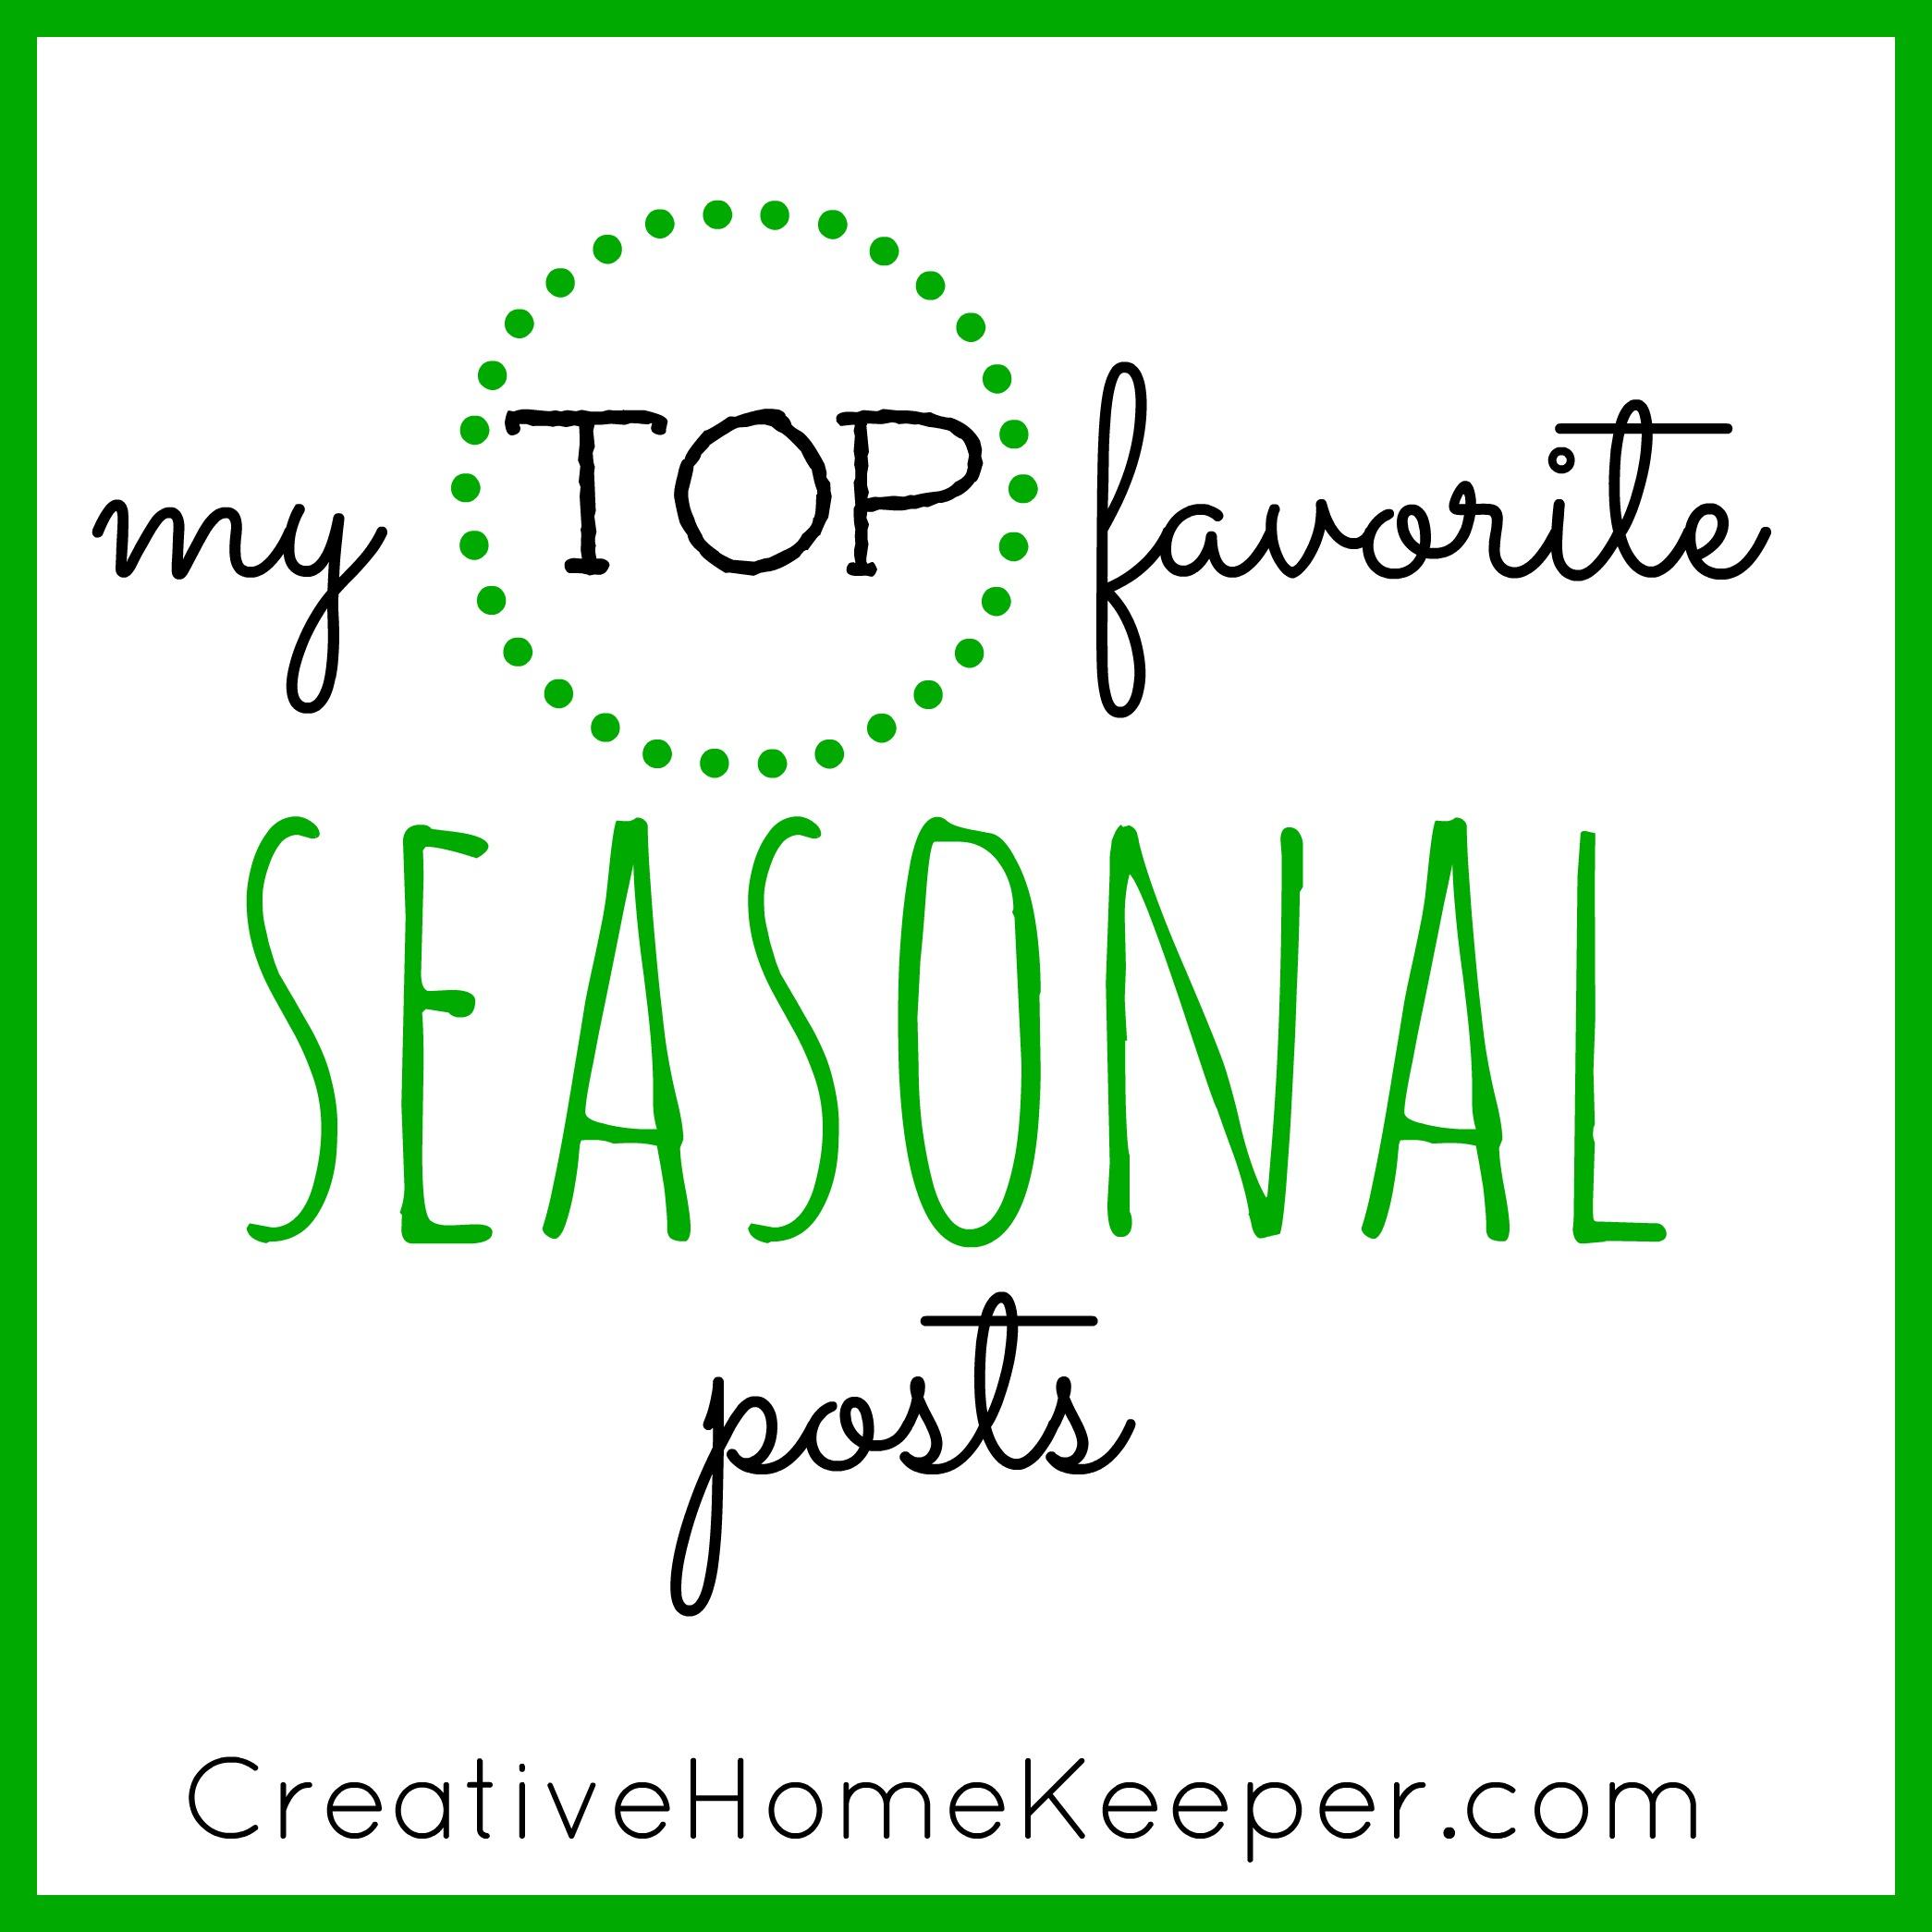 My Top Favorite Seasonal Posts